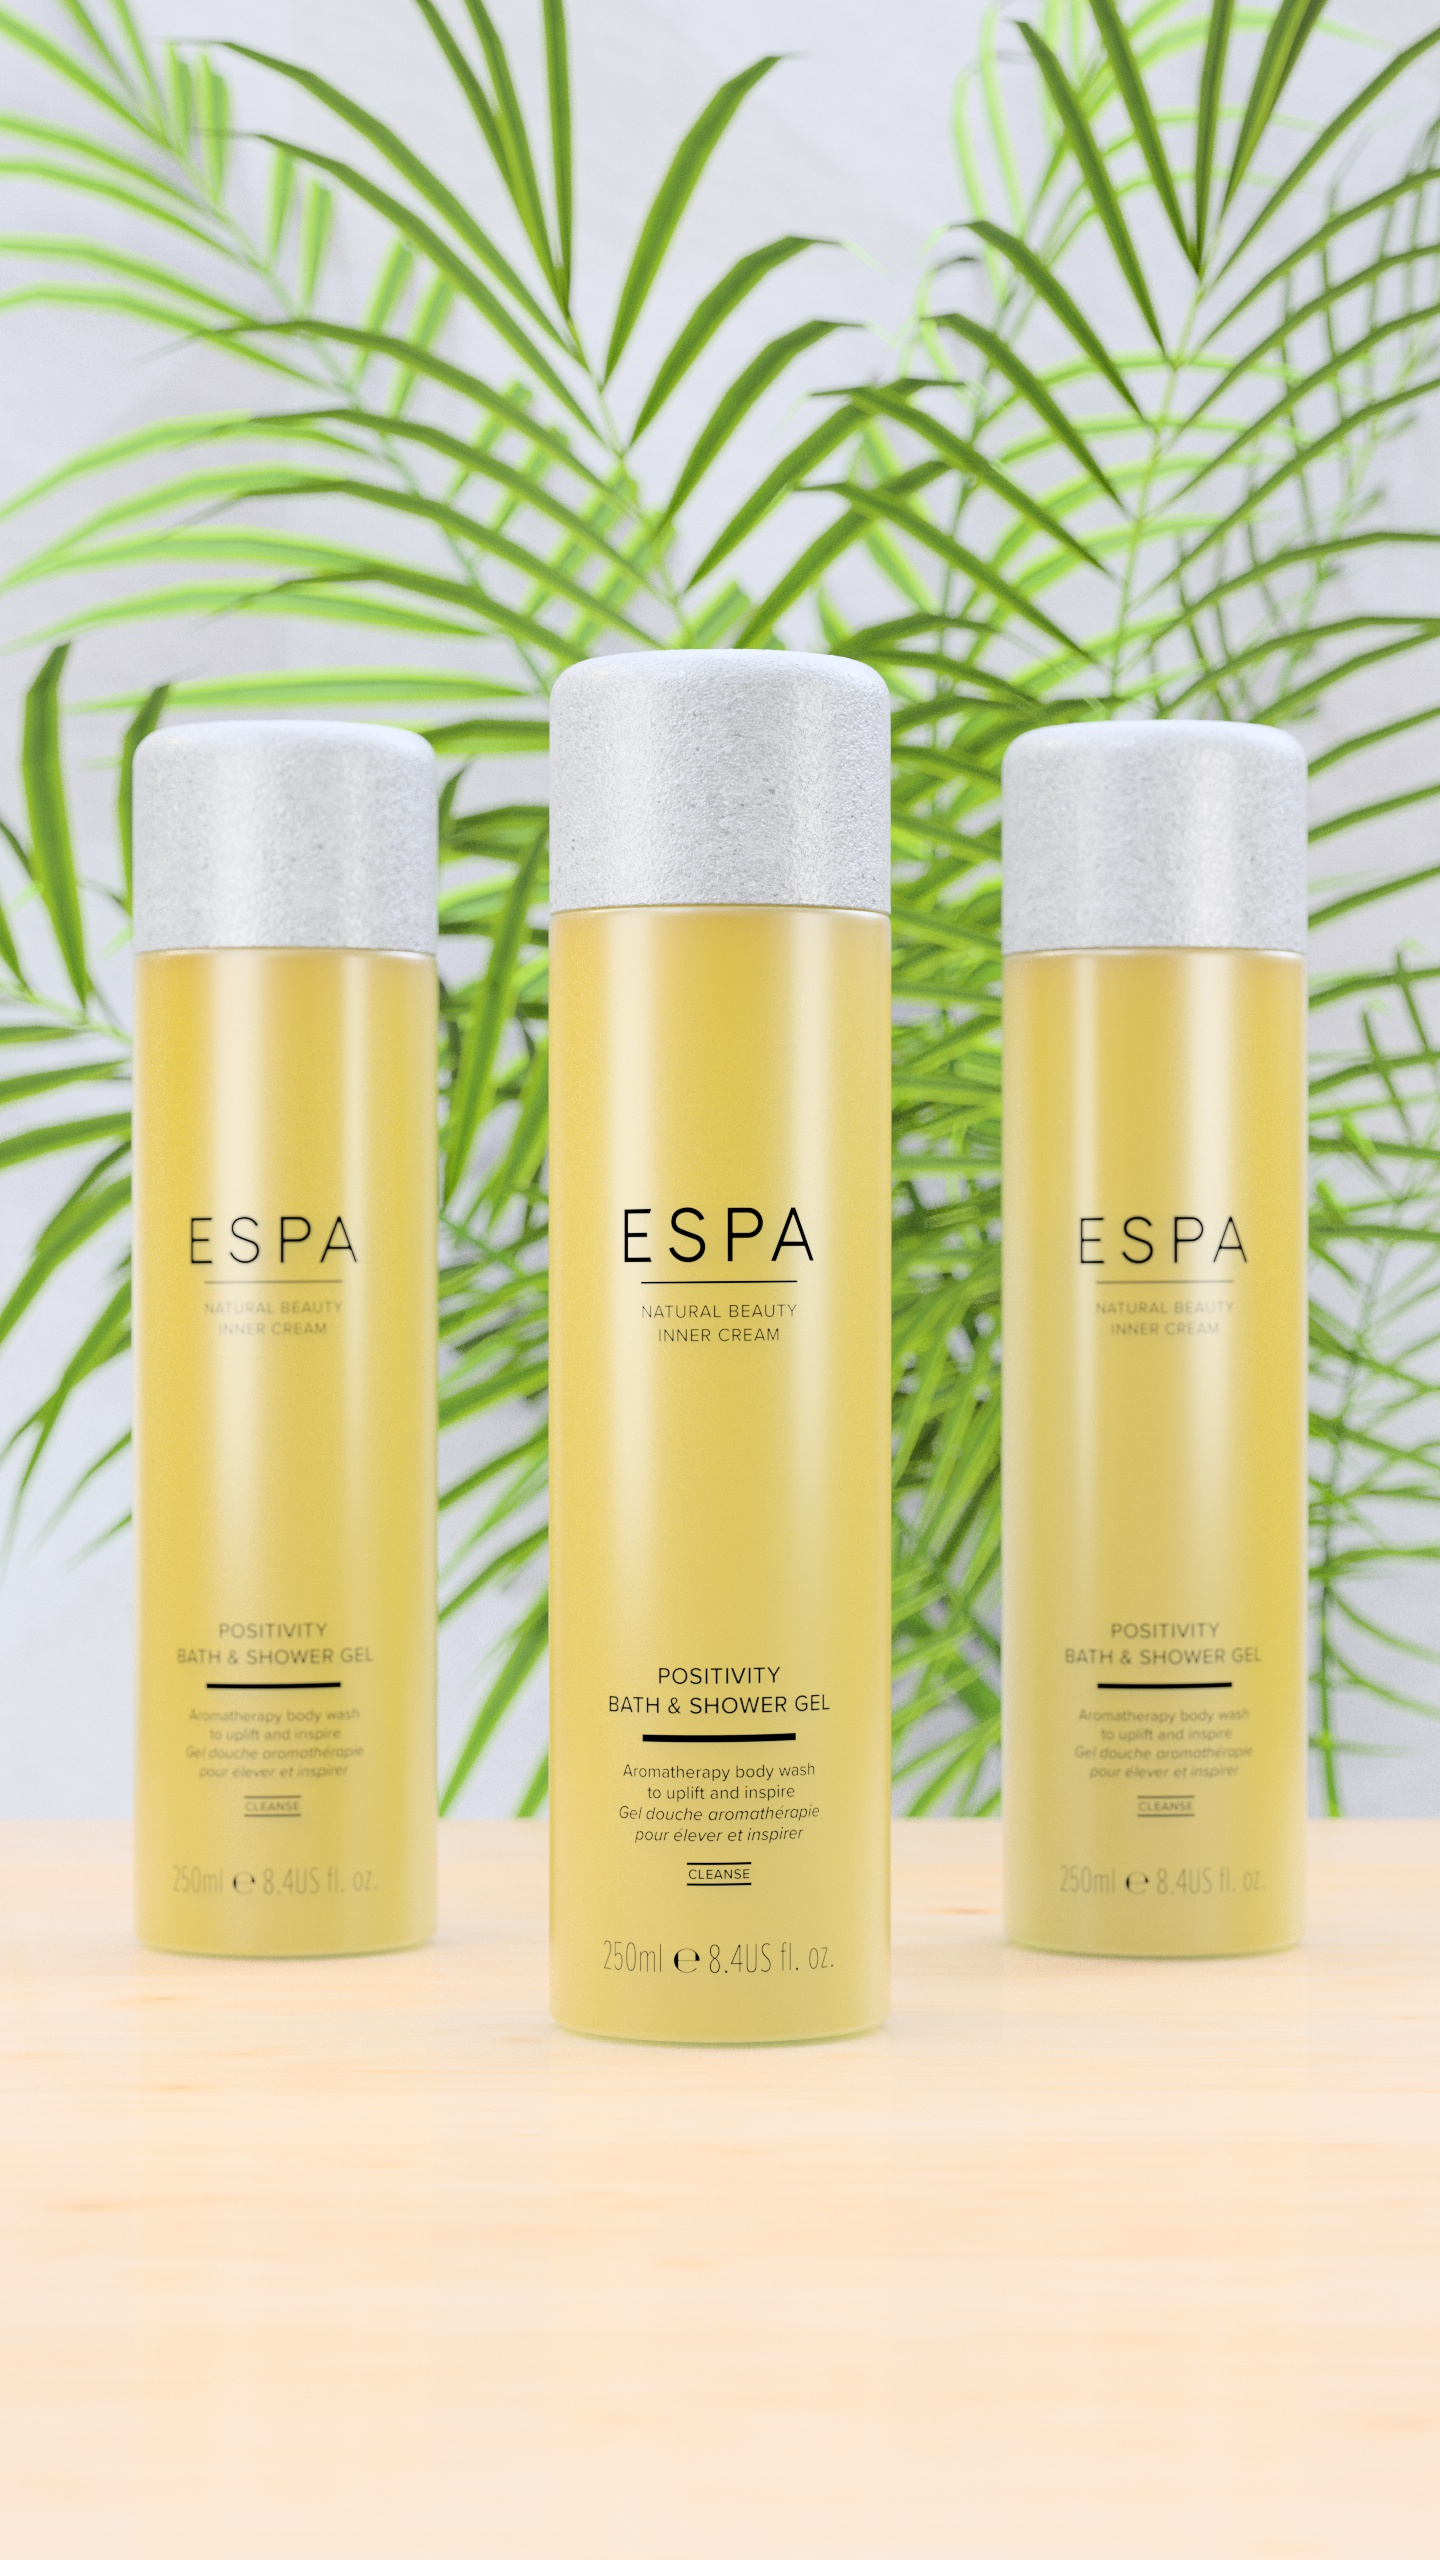 ESPA Product Range_2021-01-20_House_2_1.